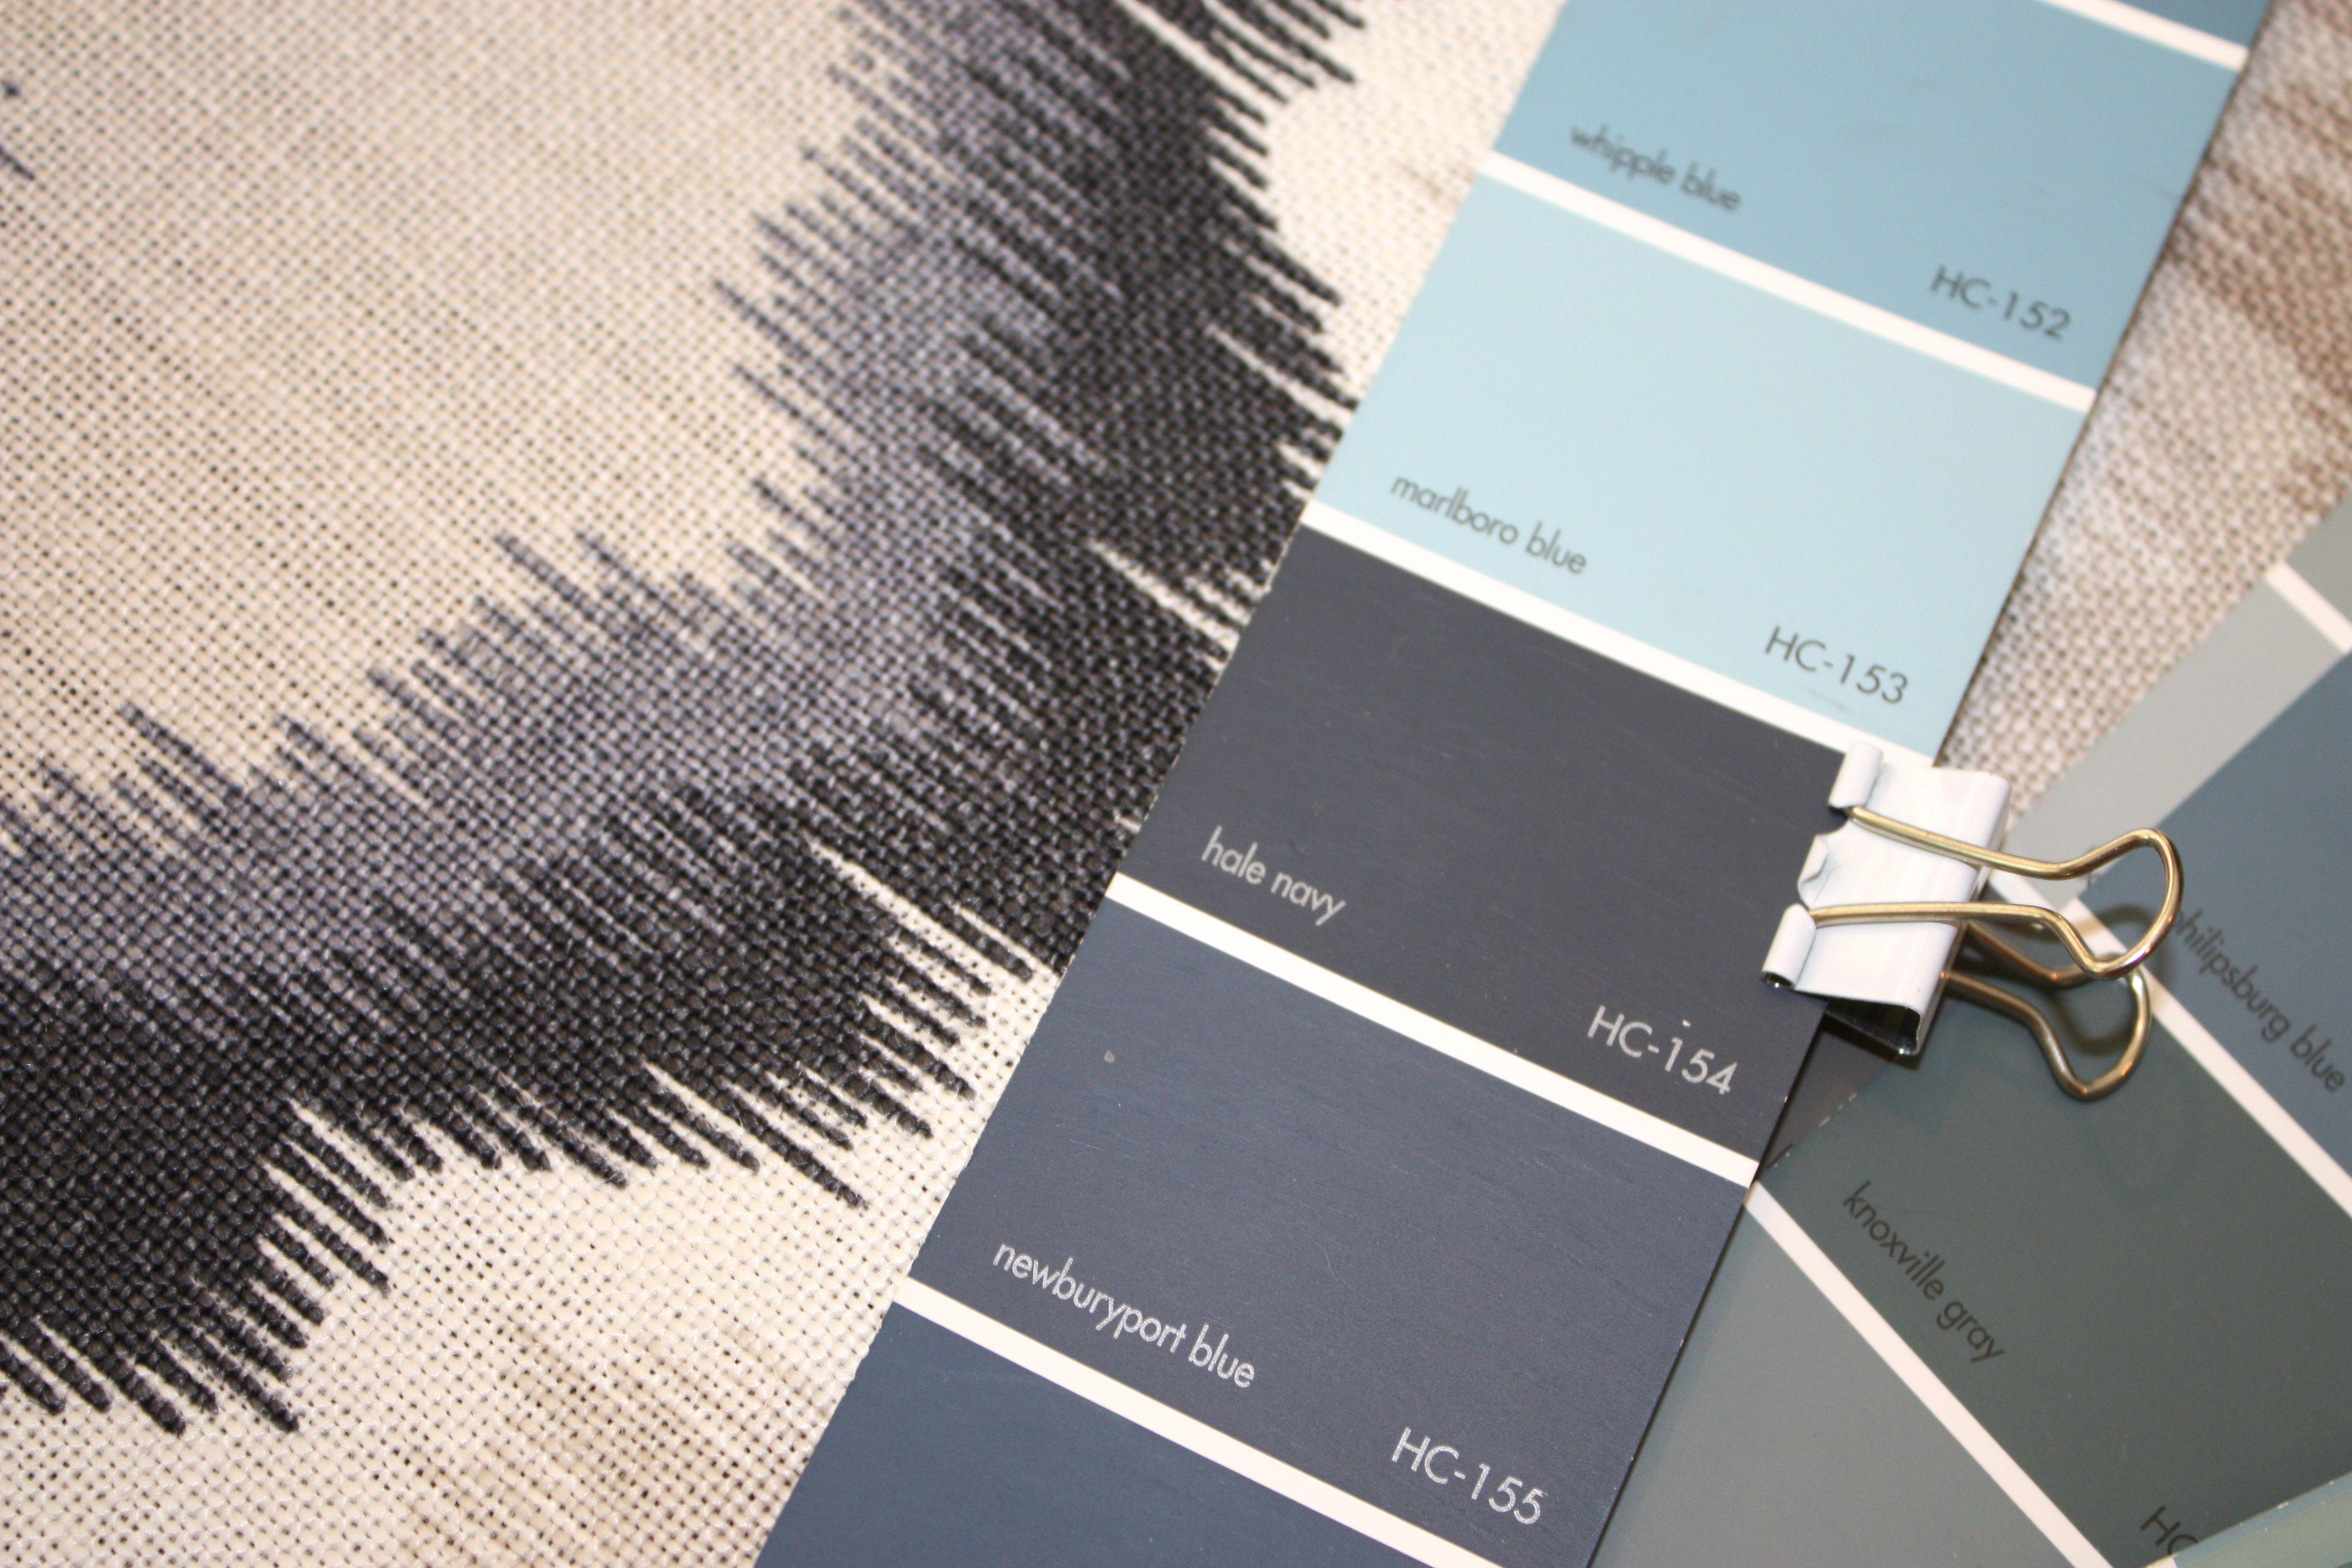 choosing a paint color palette using fabric inspiration. Black Bedroom Furniture Sets. Home Design Ideas